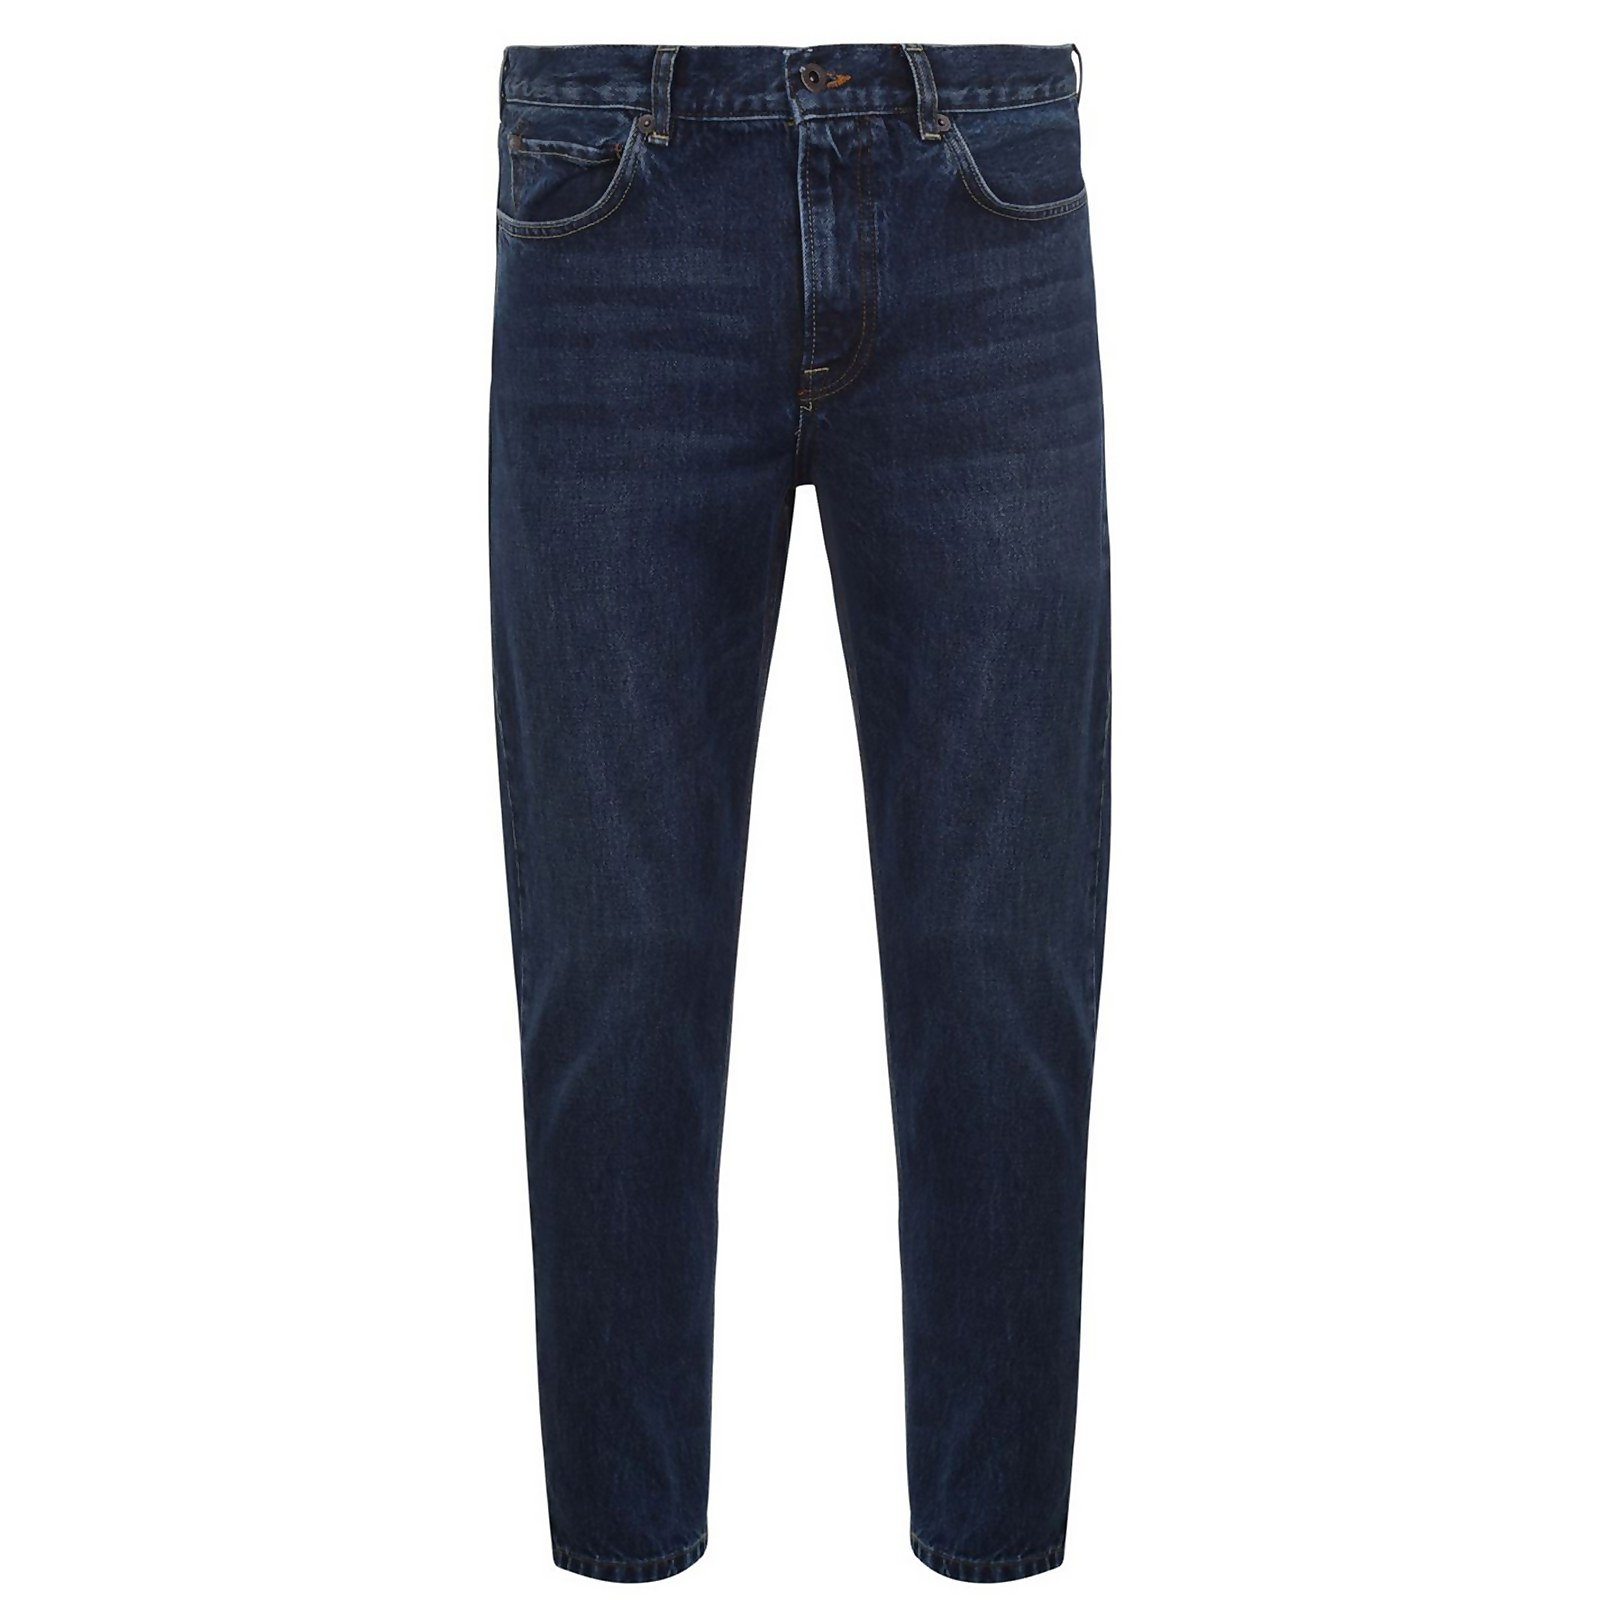 Slim Tapered Jeans - Dark Indigo - 30R